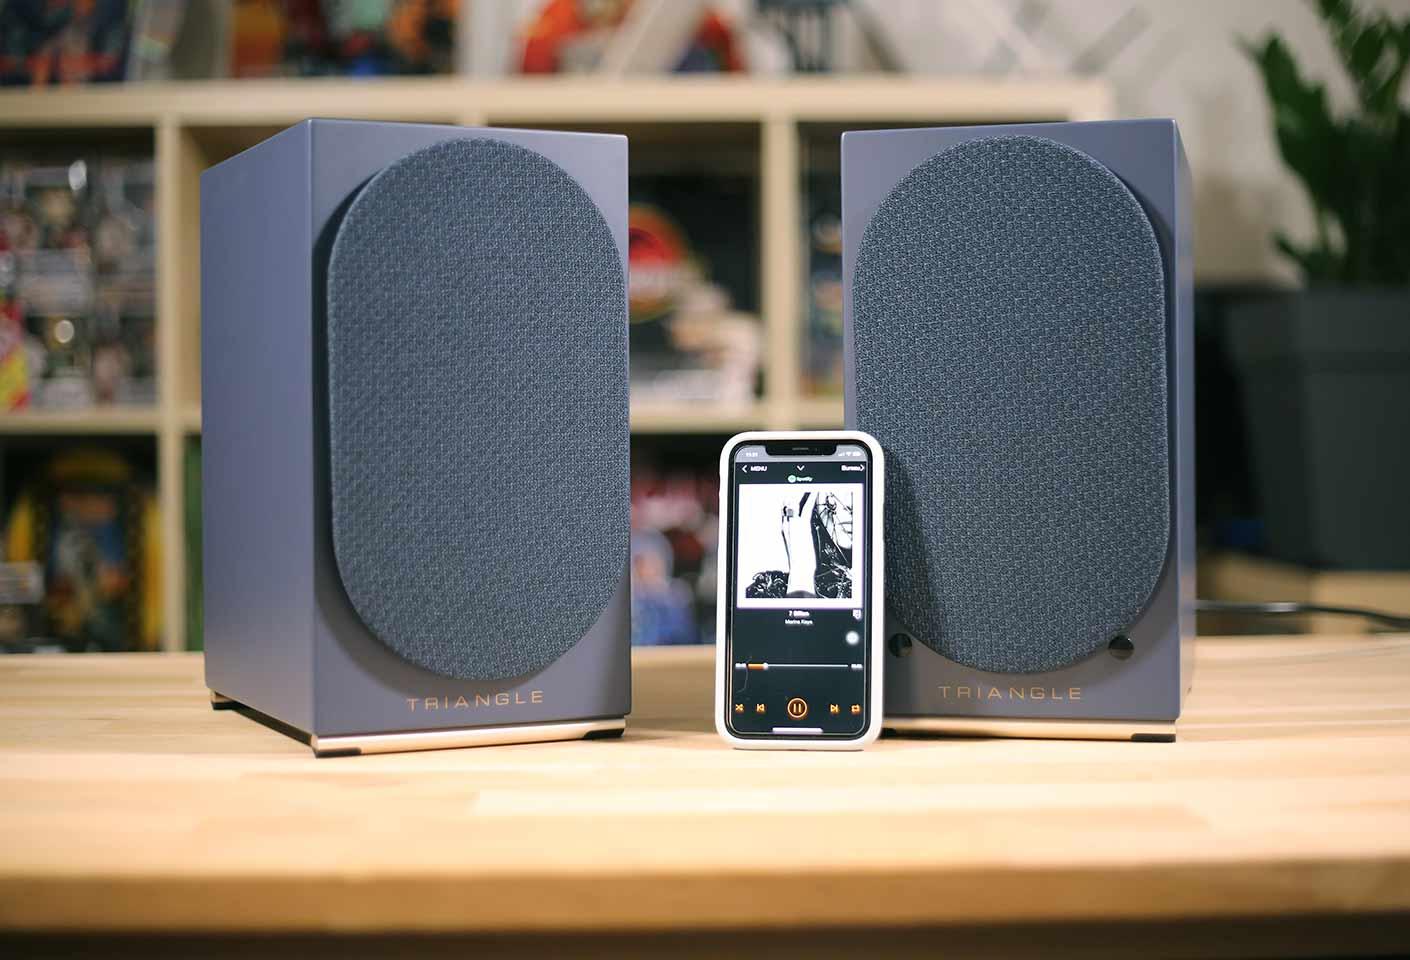 Triangle AIO Twin : Enceintes connectée, WiFi, AirPlay, Bluetooth et multiroom